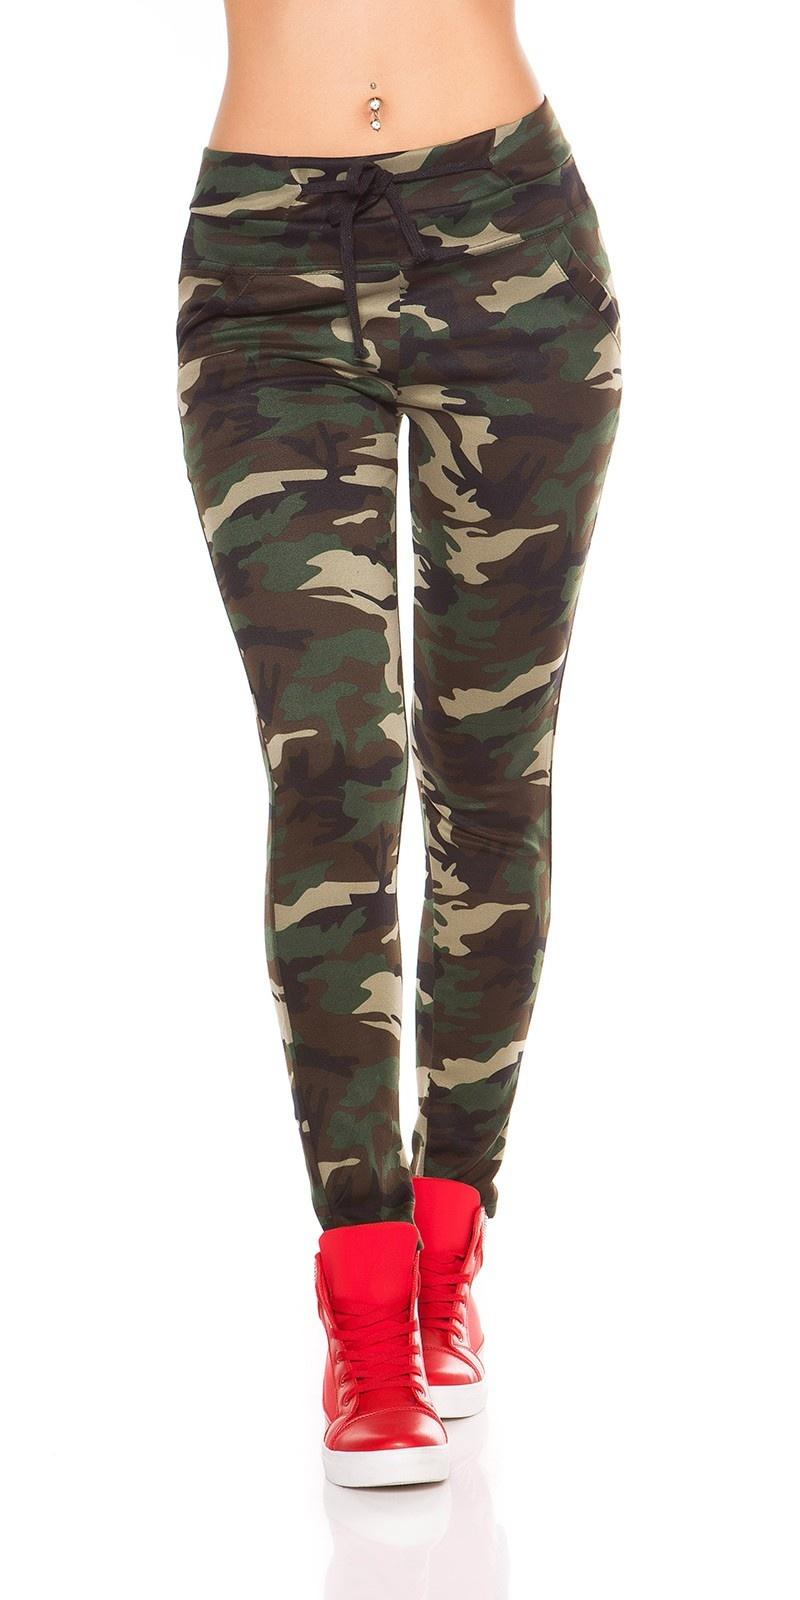 Sexy leggings in camouflage khaki